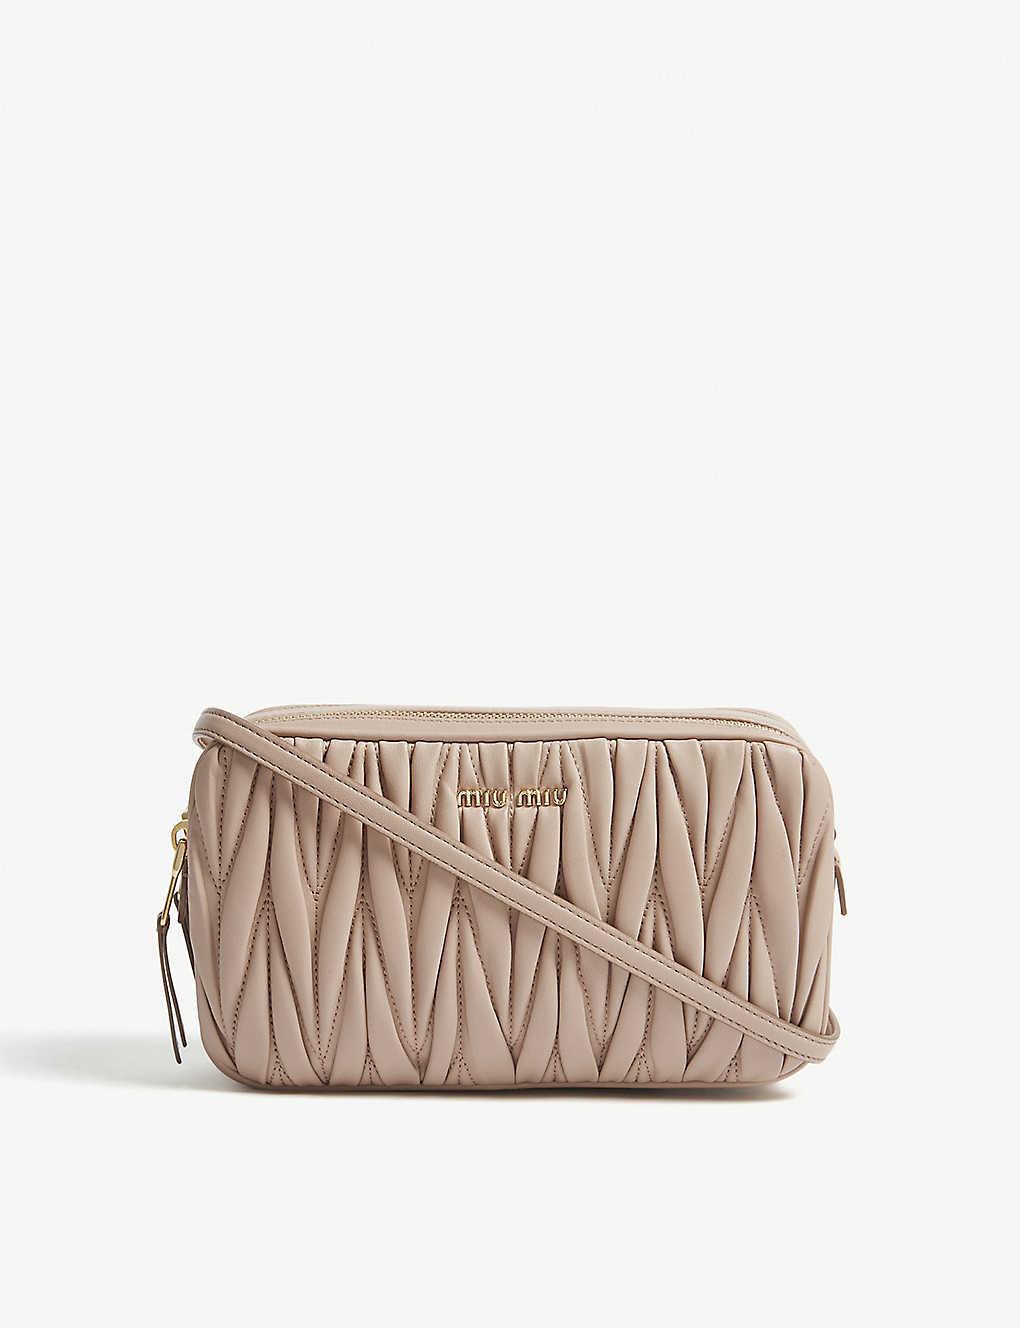 69c17617e473a MIU MIU - Matelassé leather cross-body bag